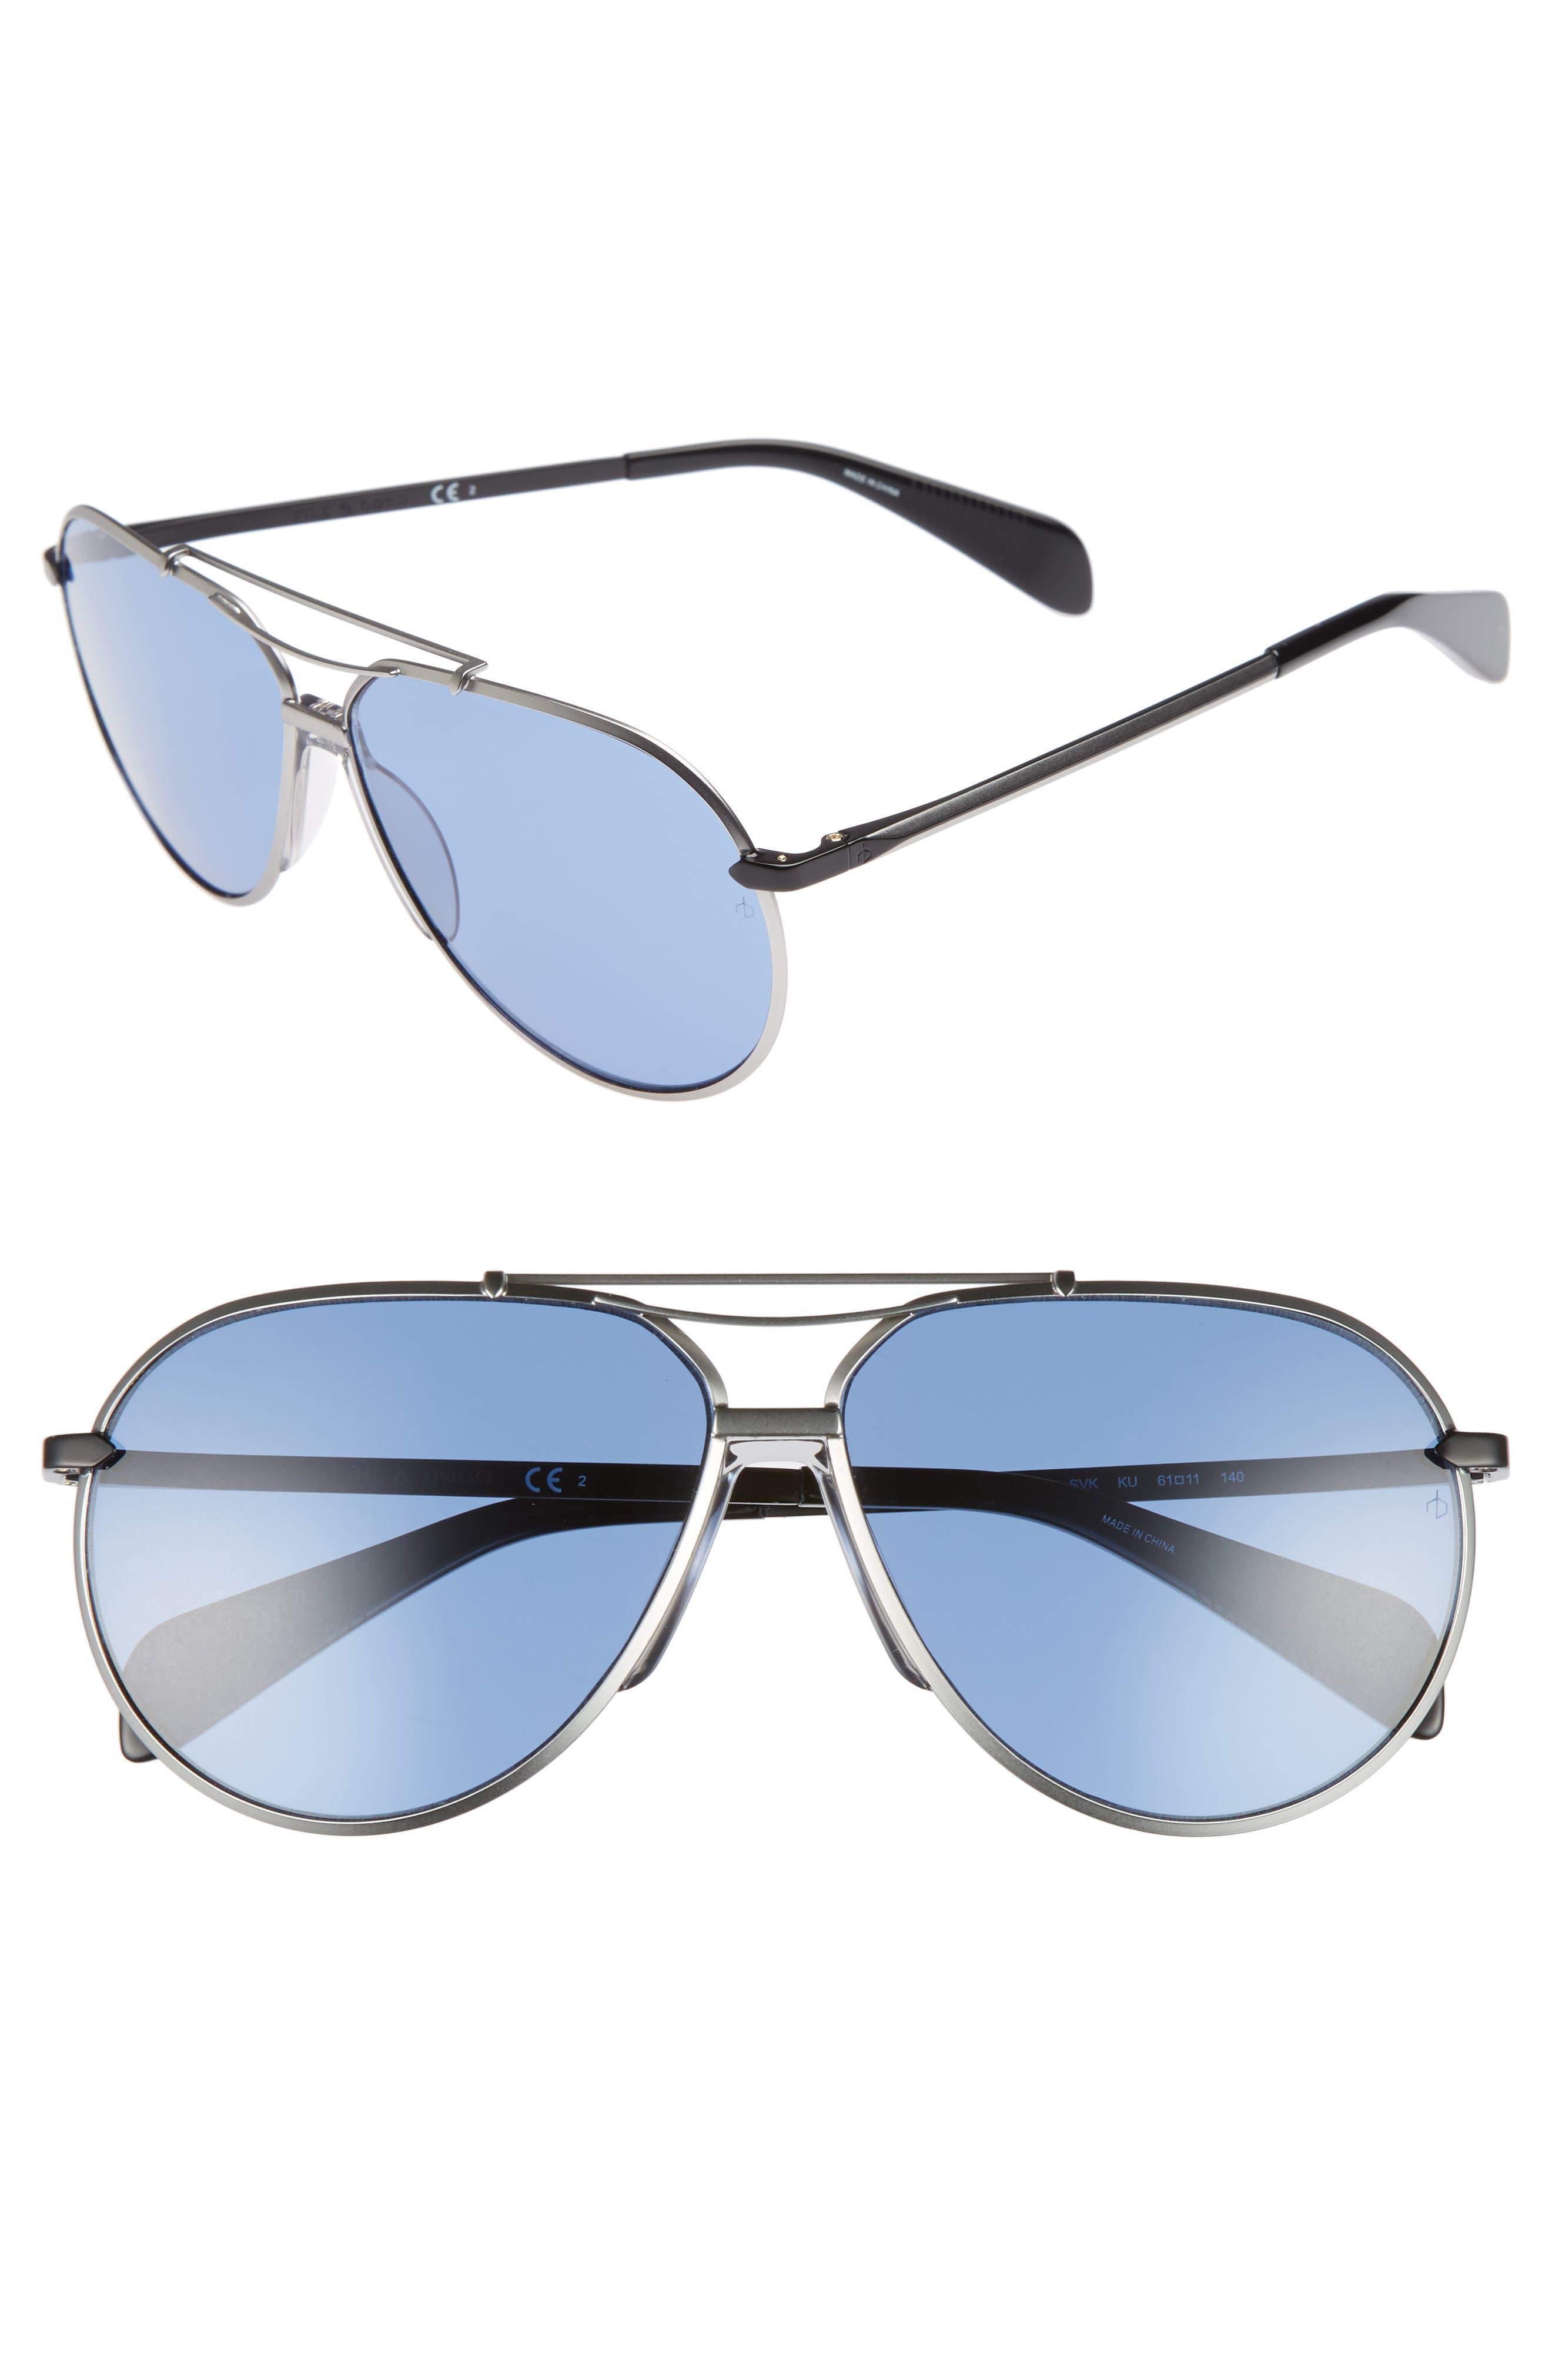 Alternate Image 1 Selected - rag & bone 61mm Aviator Sunglasses